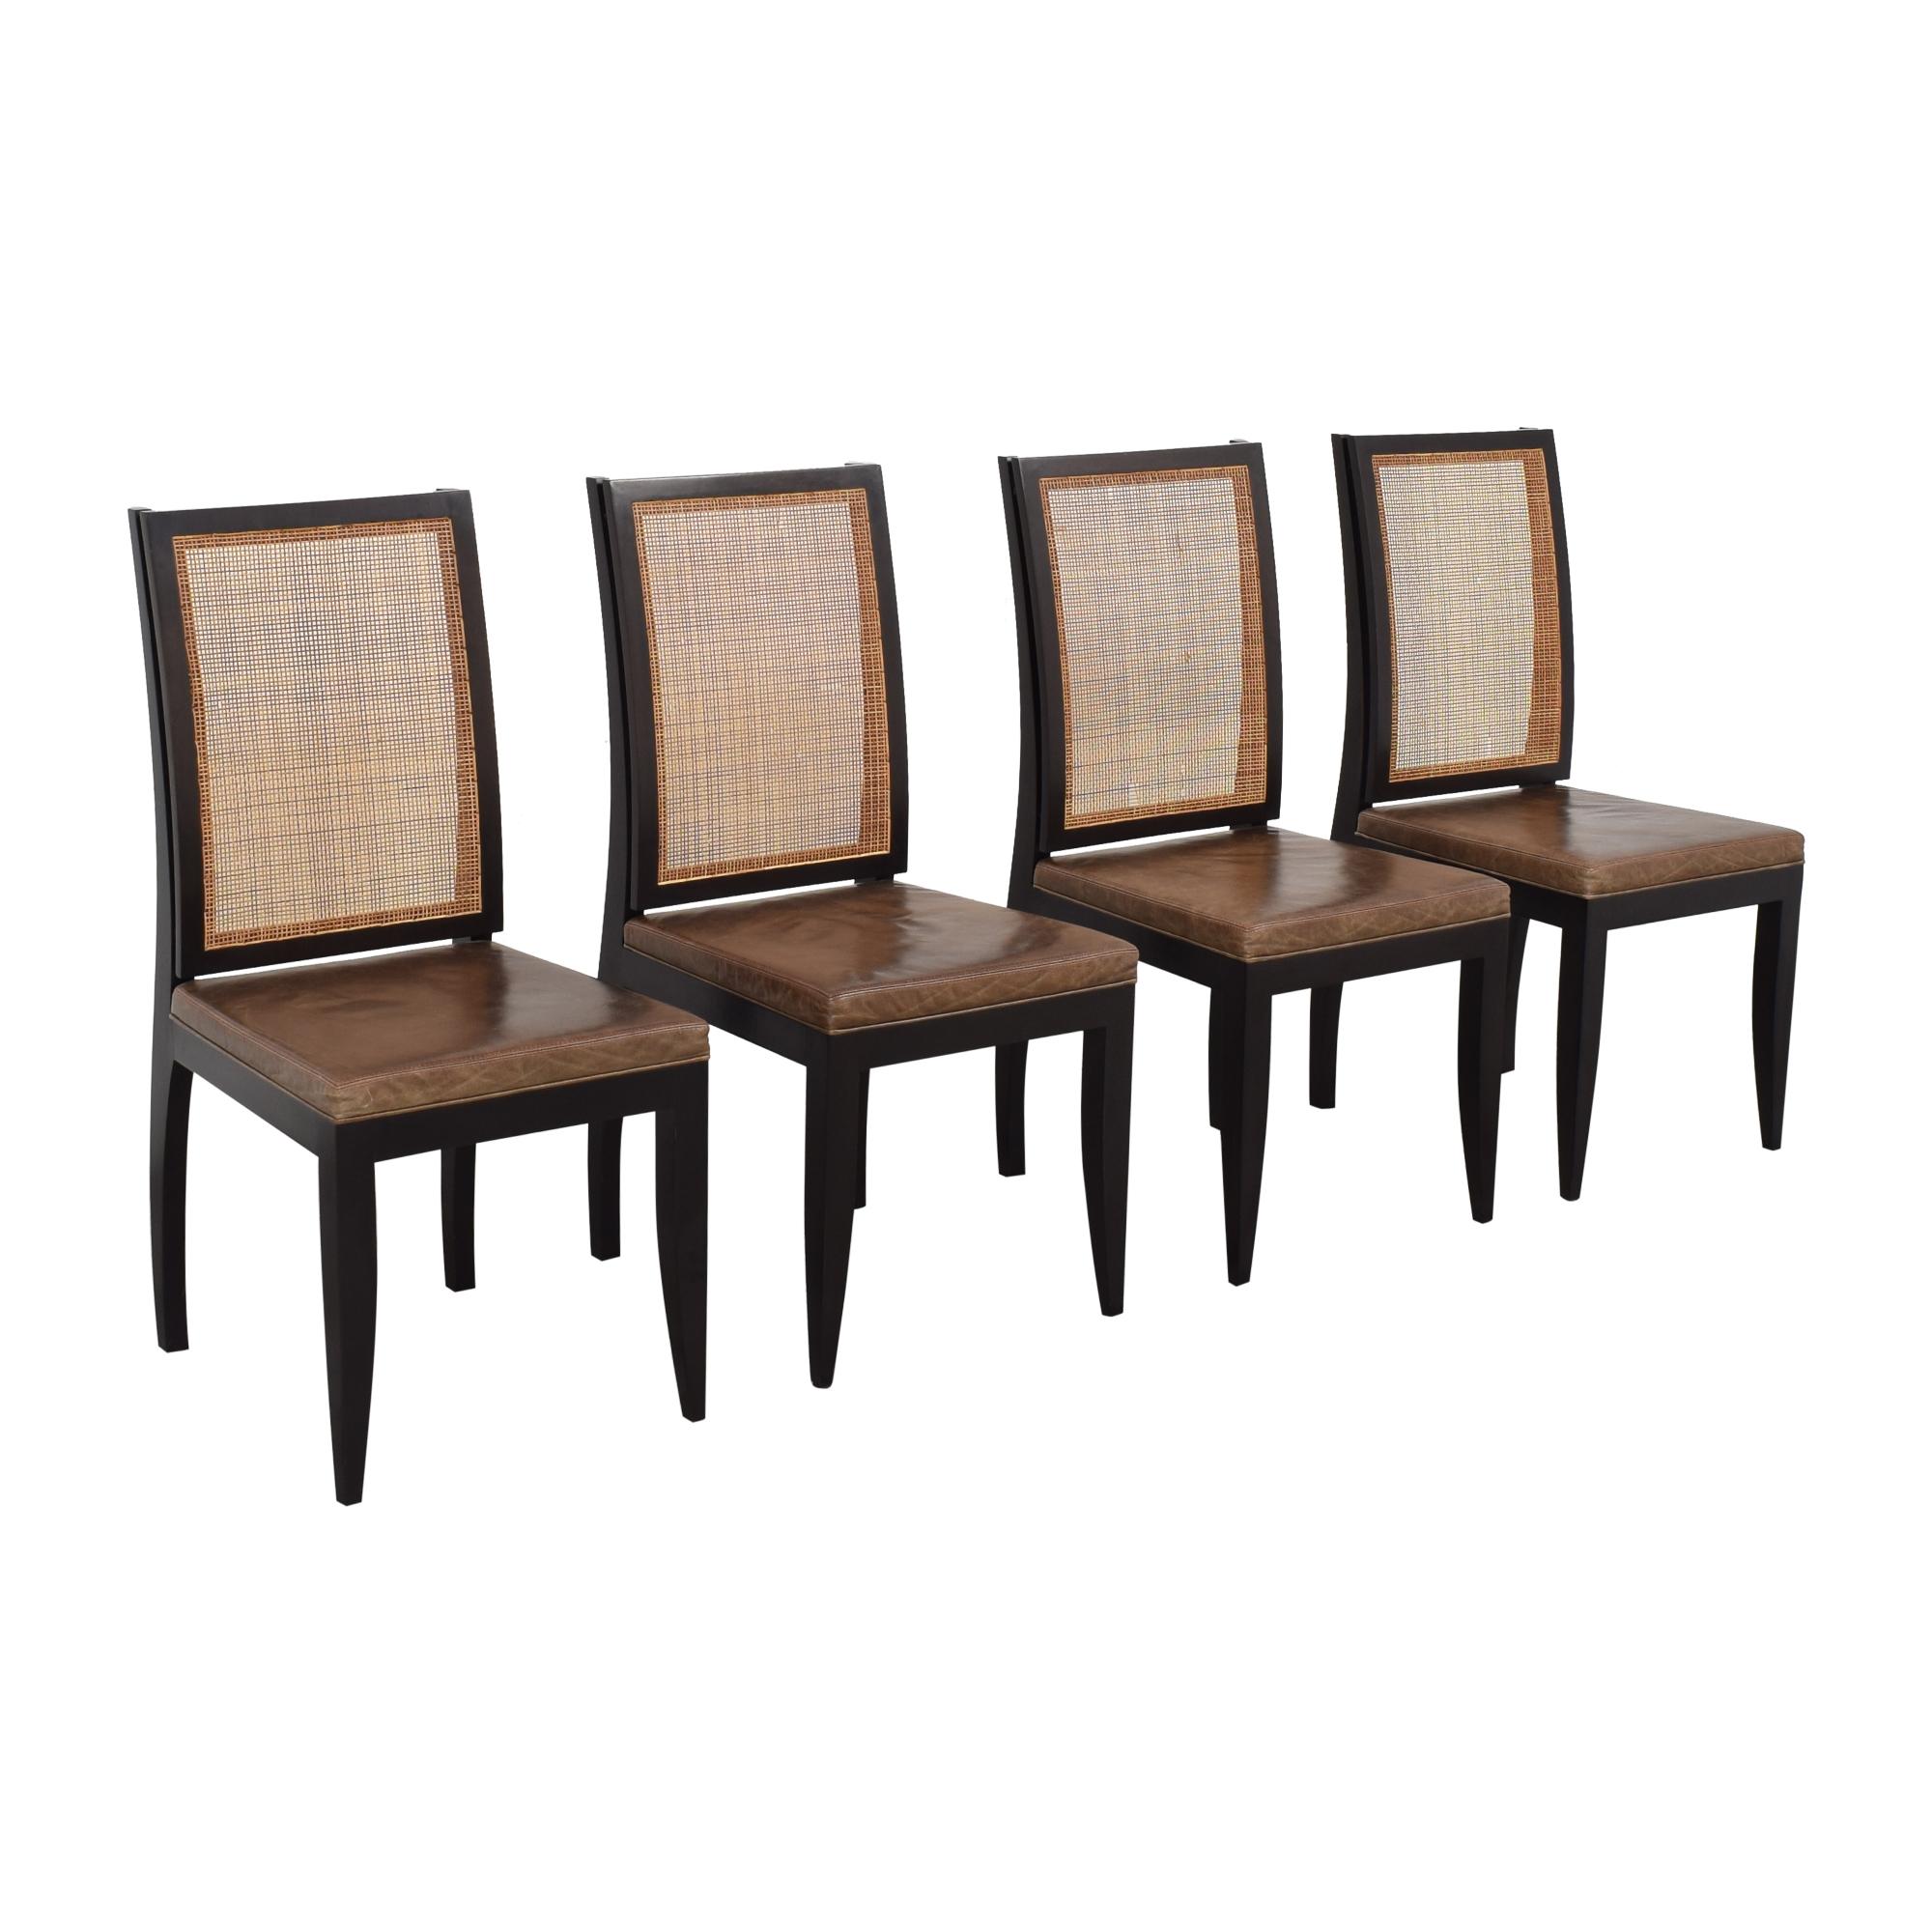 Etel Carmona Straw Chairs